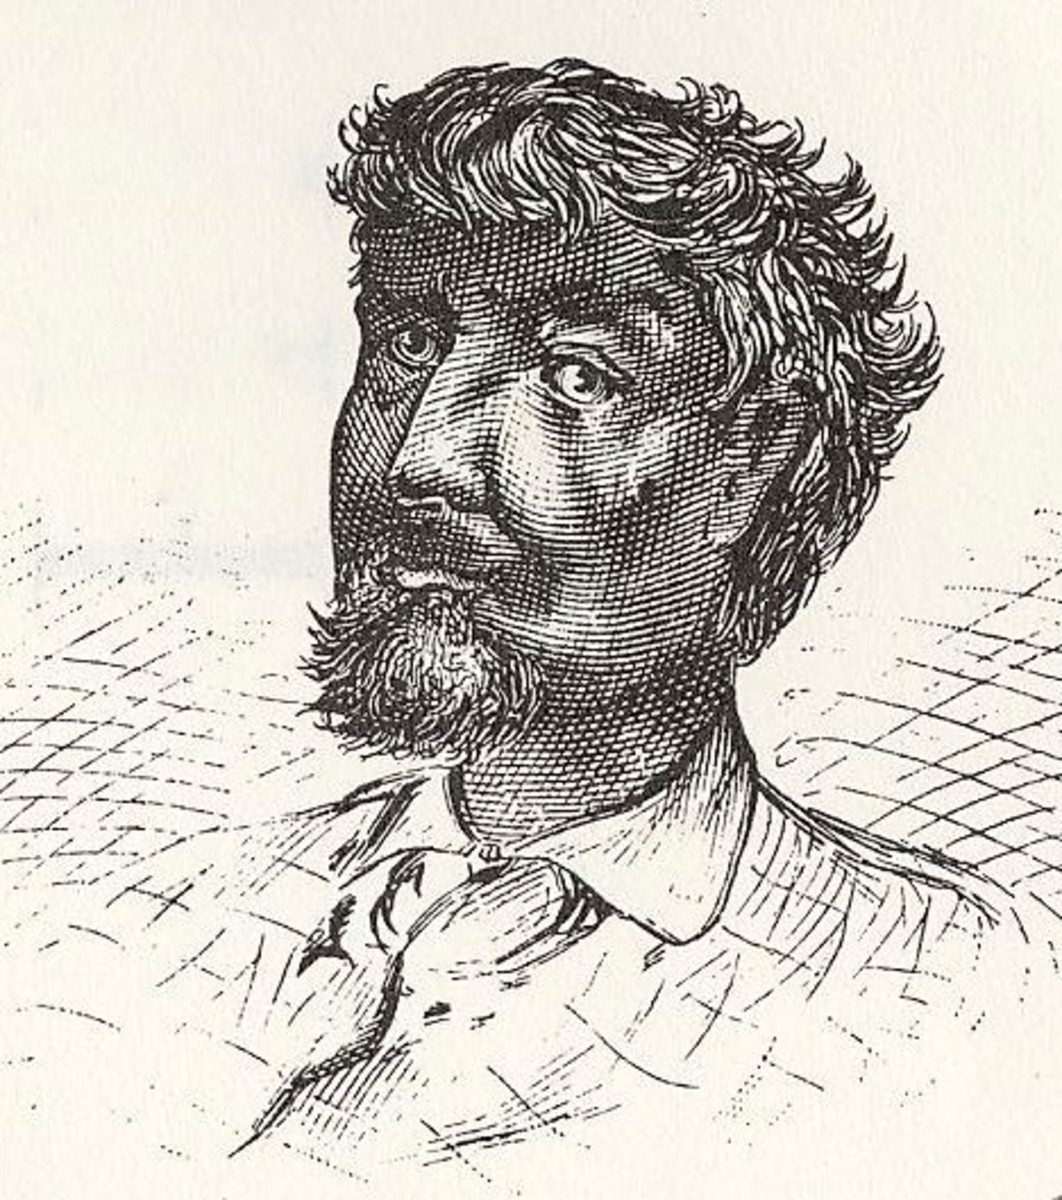 Chicago city founder